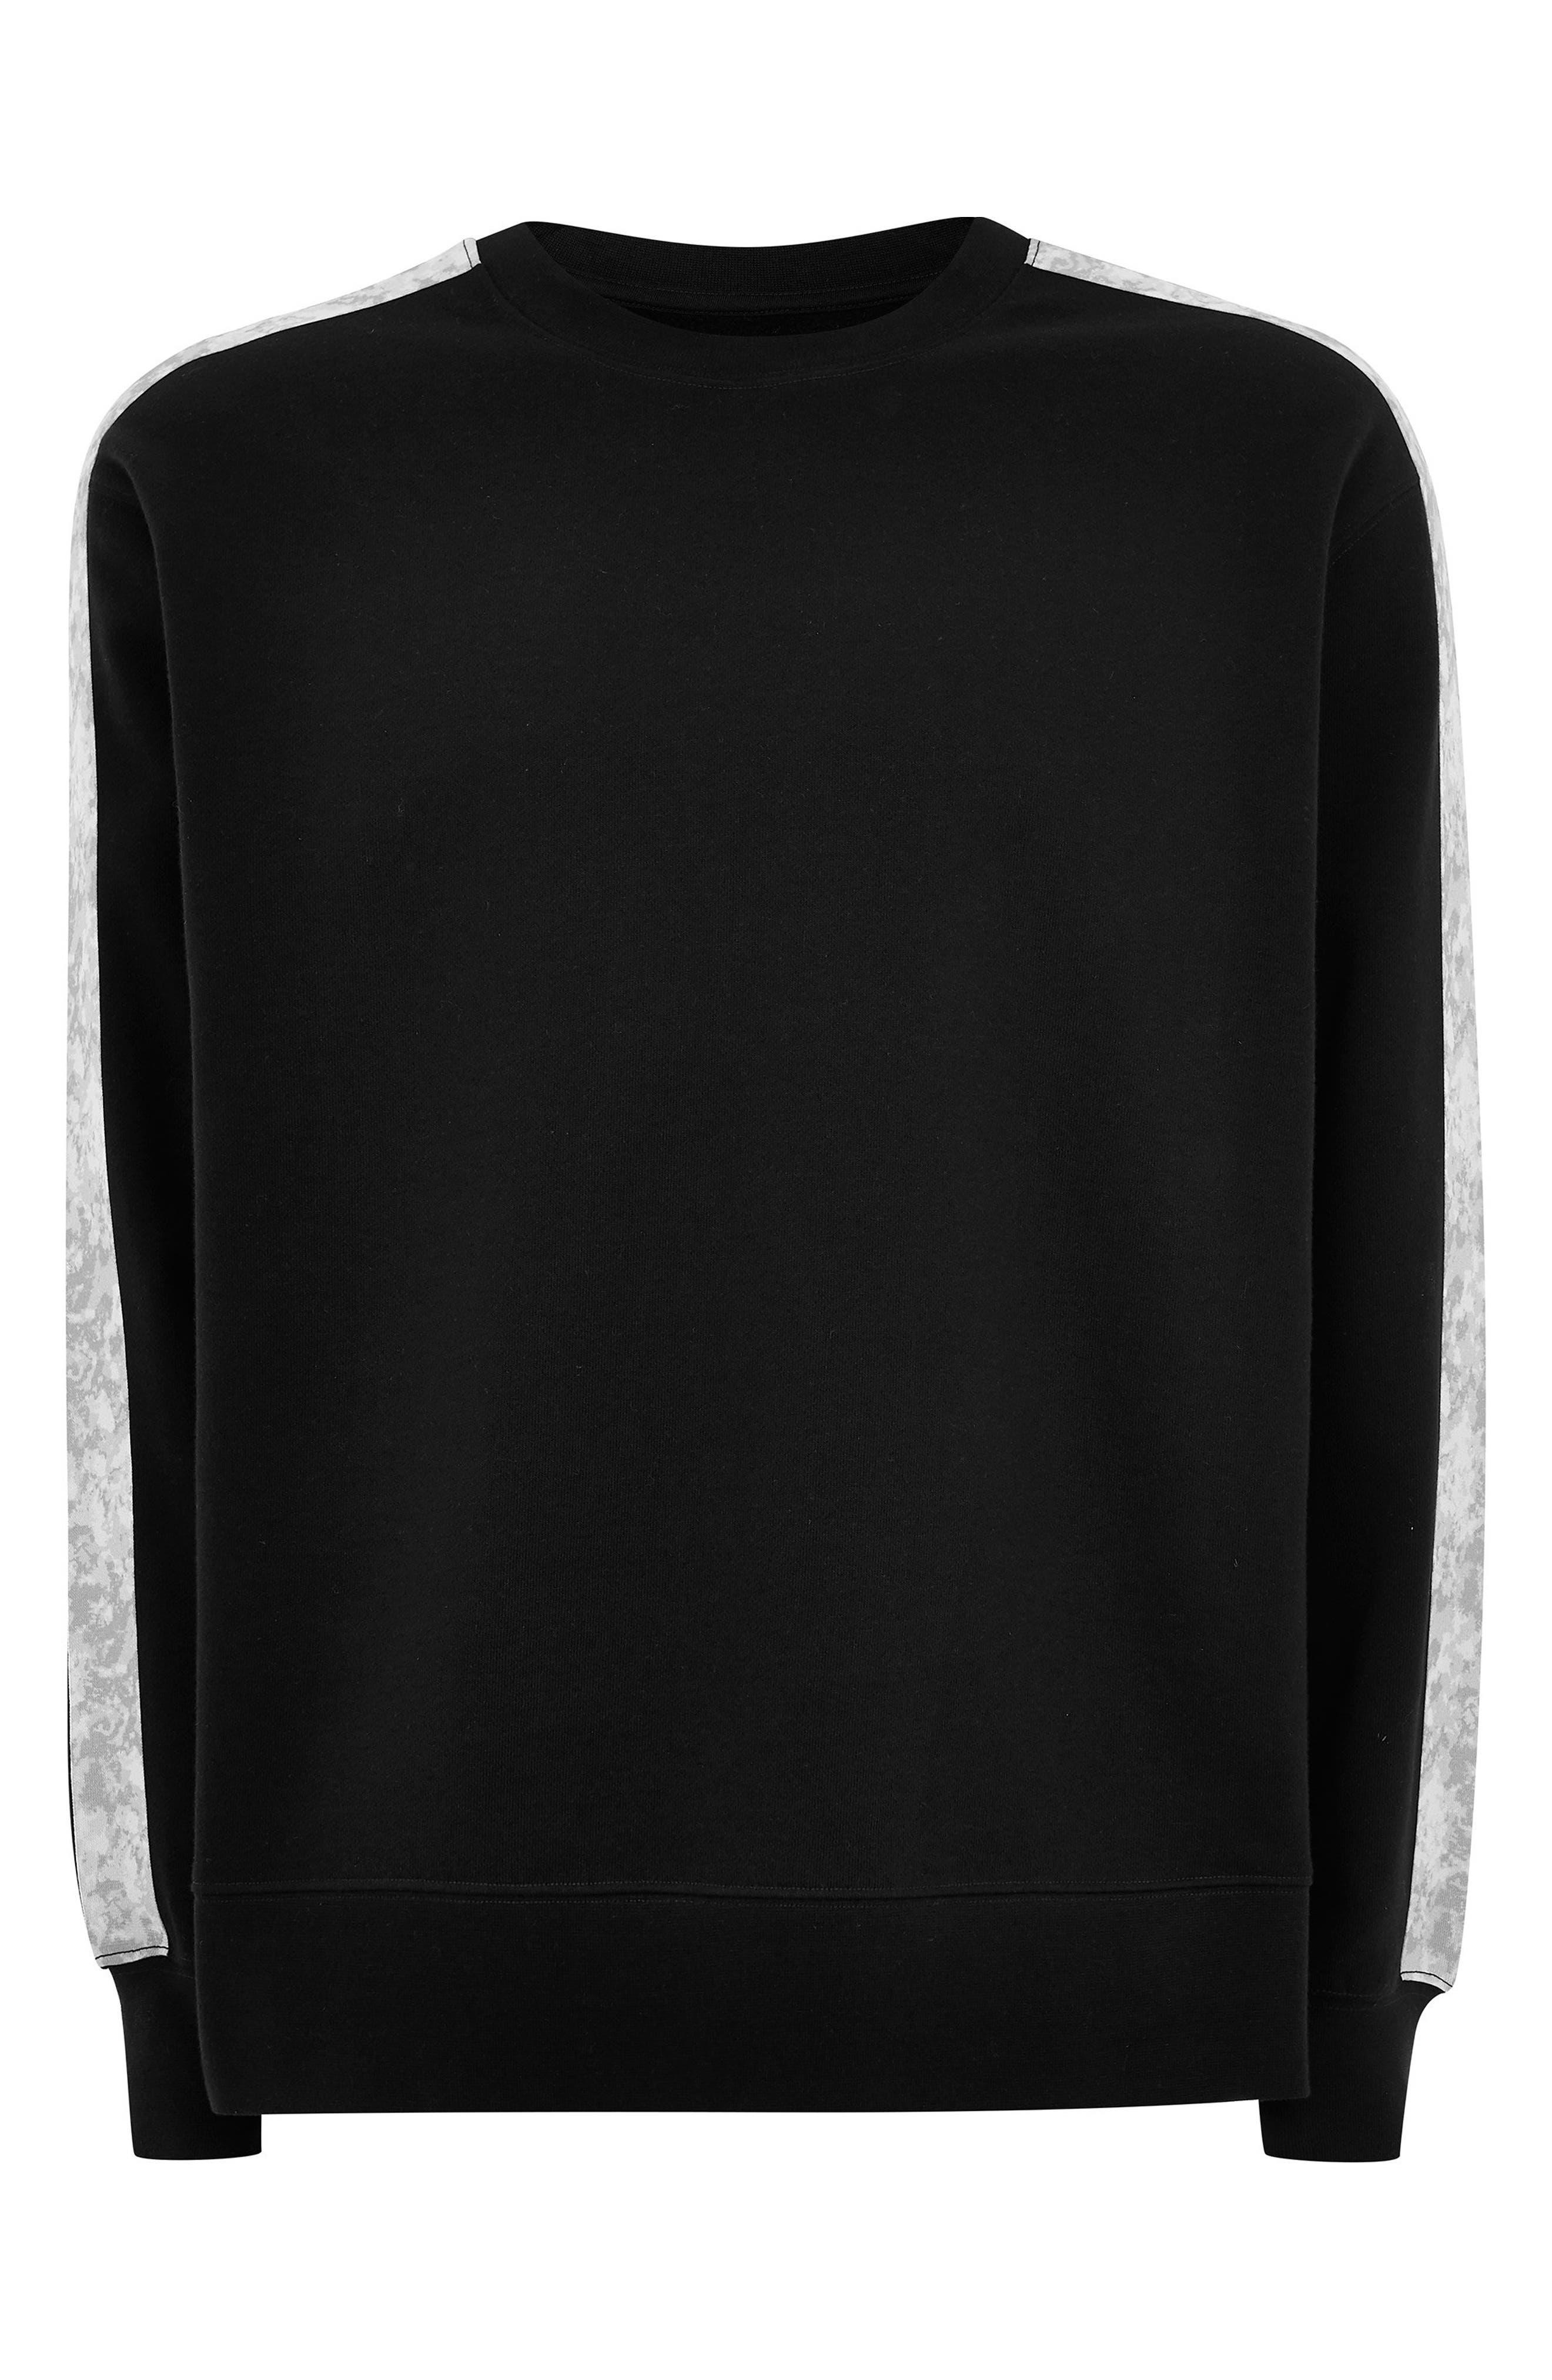 TOPMAN, Sublimated Tape Crewneck Sweatshirt, Alternate thumbnail 4, color, BLACK MULTI